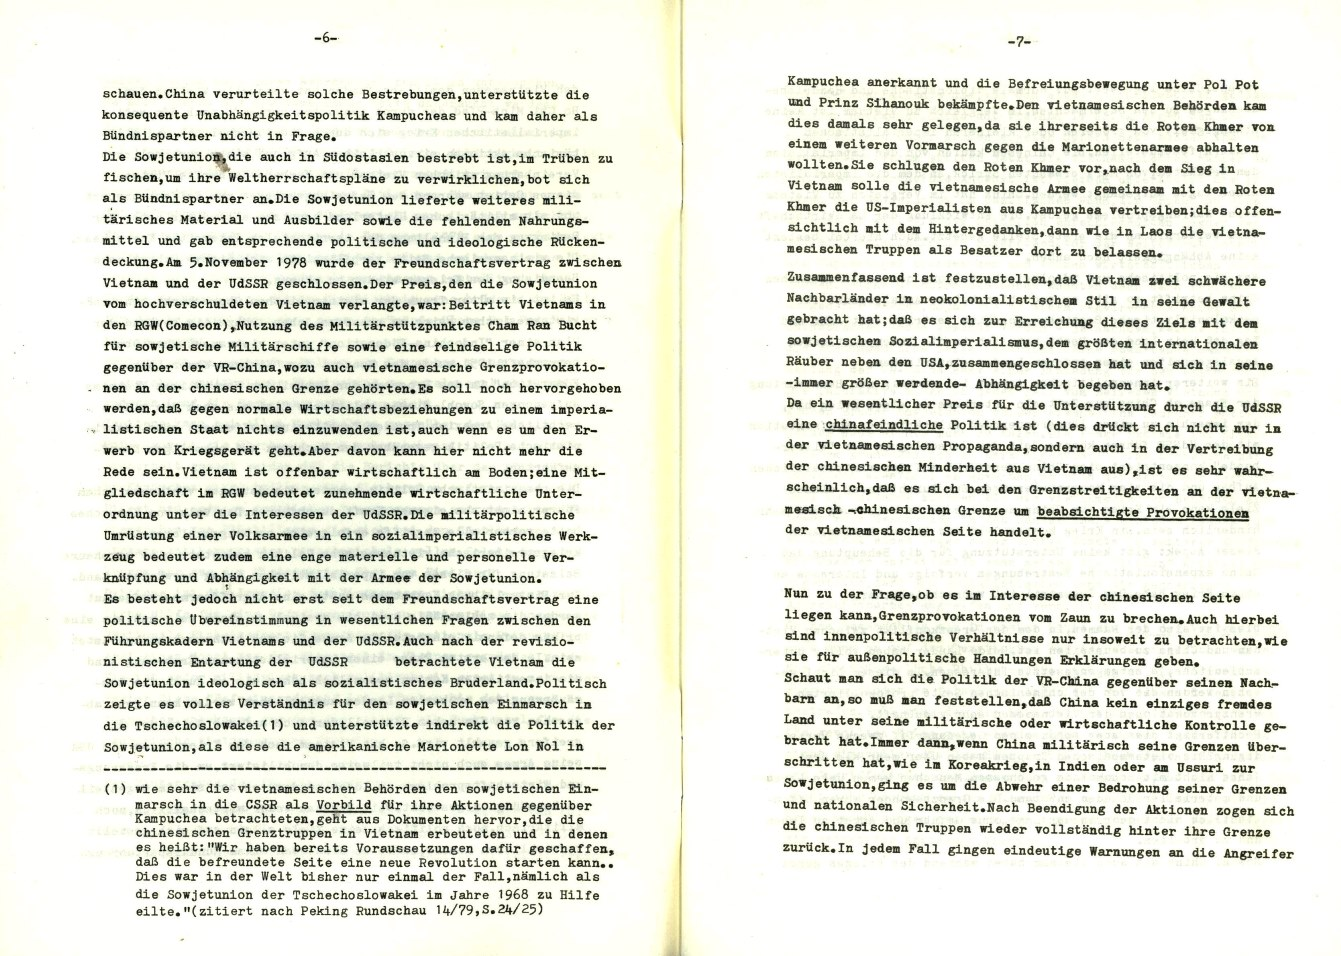 Muenchen_Kampf_dem_Revisionismus_1979_10_04